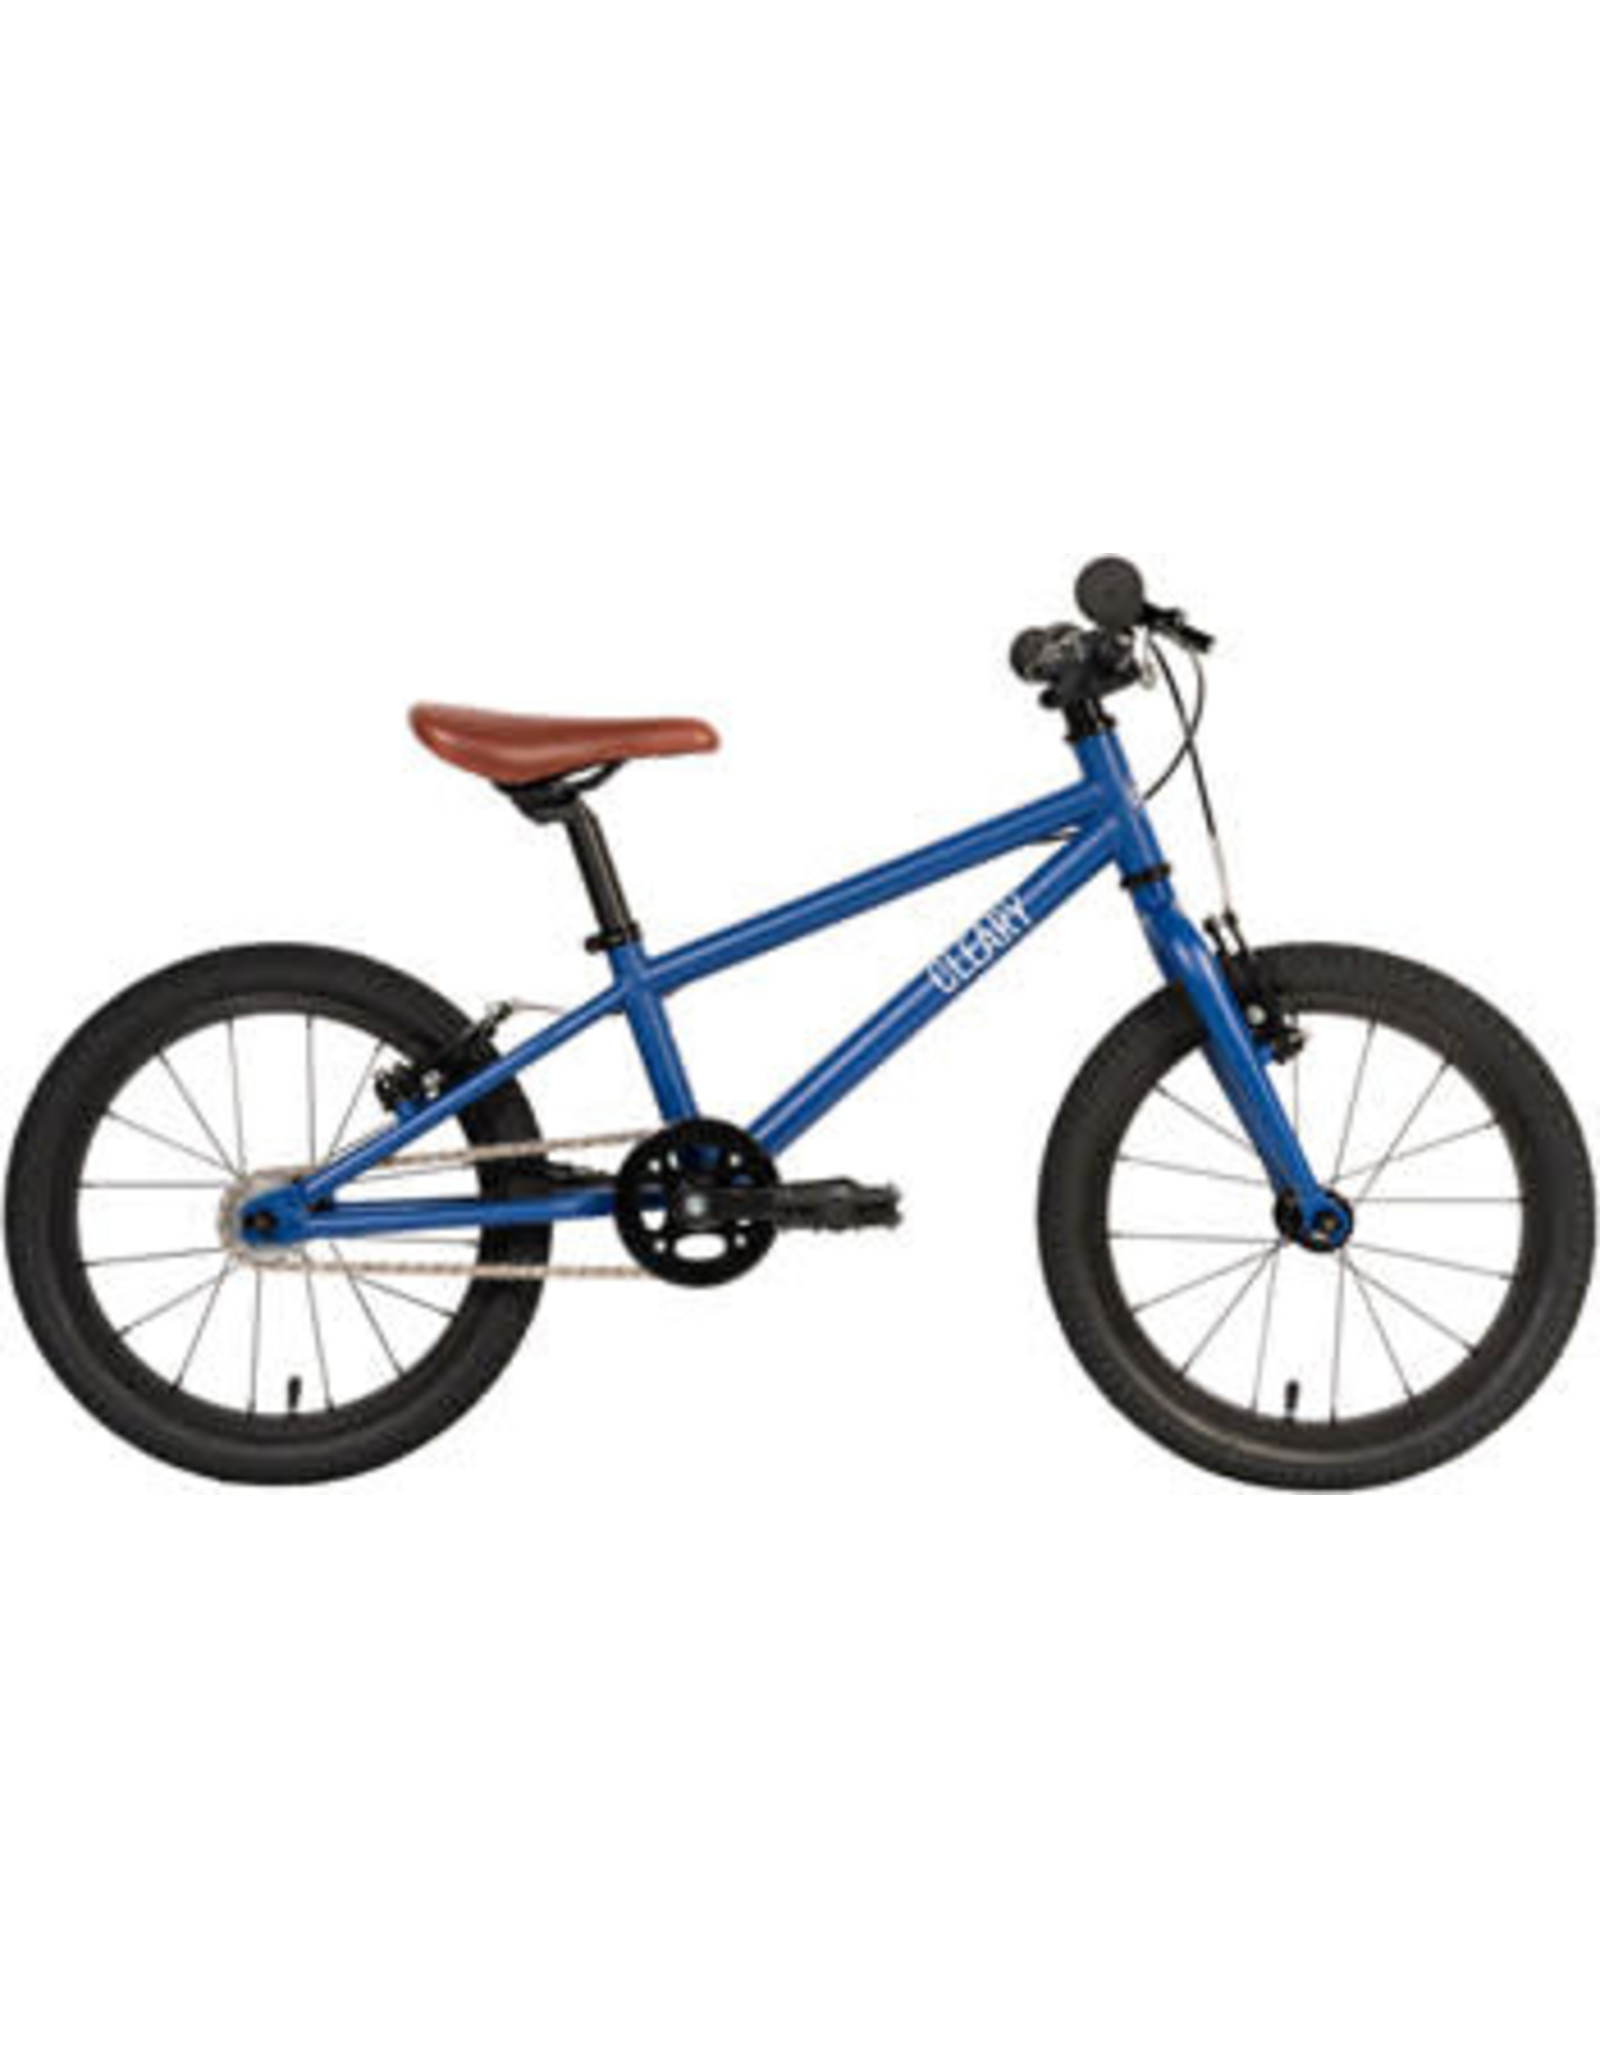 "Cleary Bikes Cleary Bikes Hedgehog 16"" Single Speed  -  Blue Hawaii/Cream"